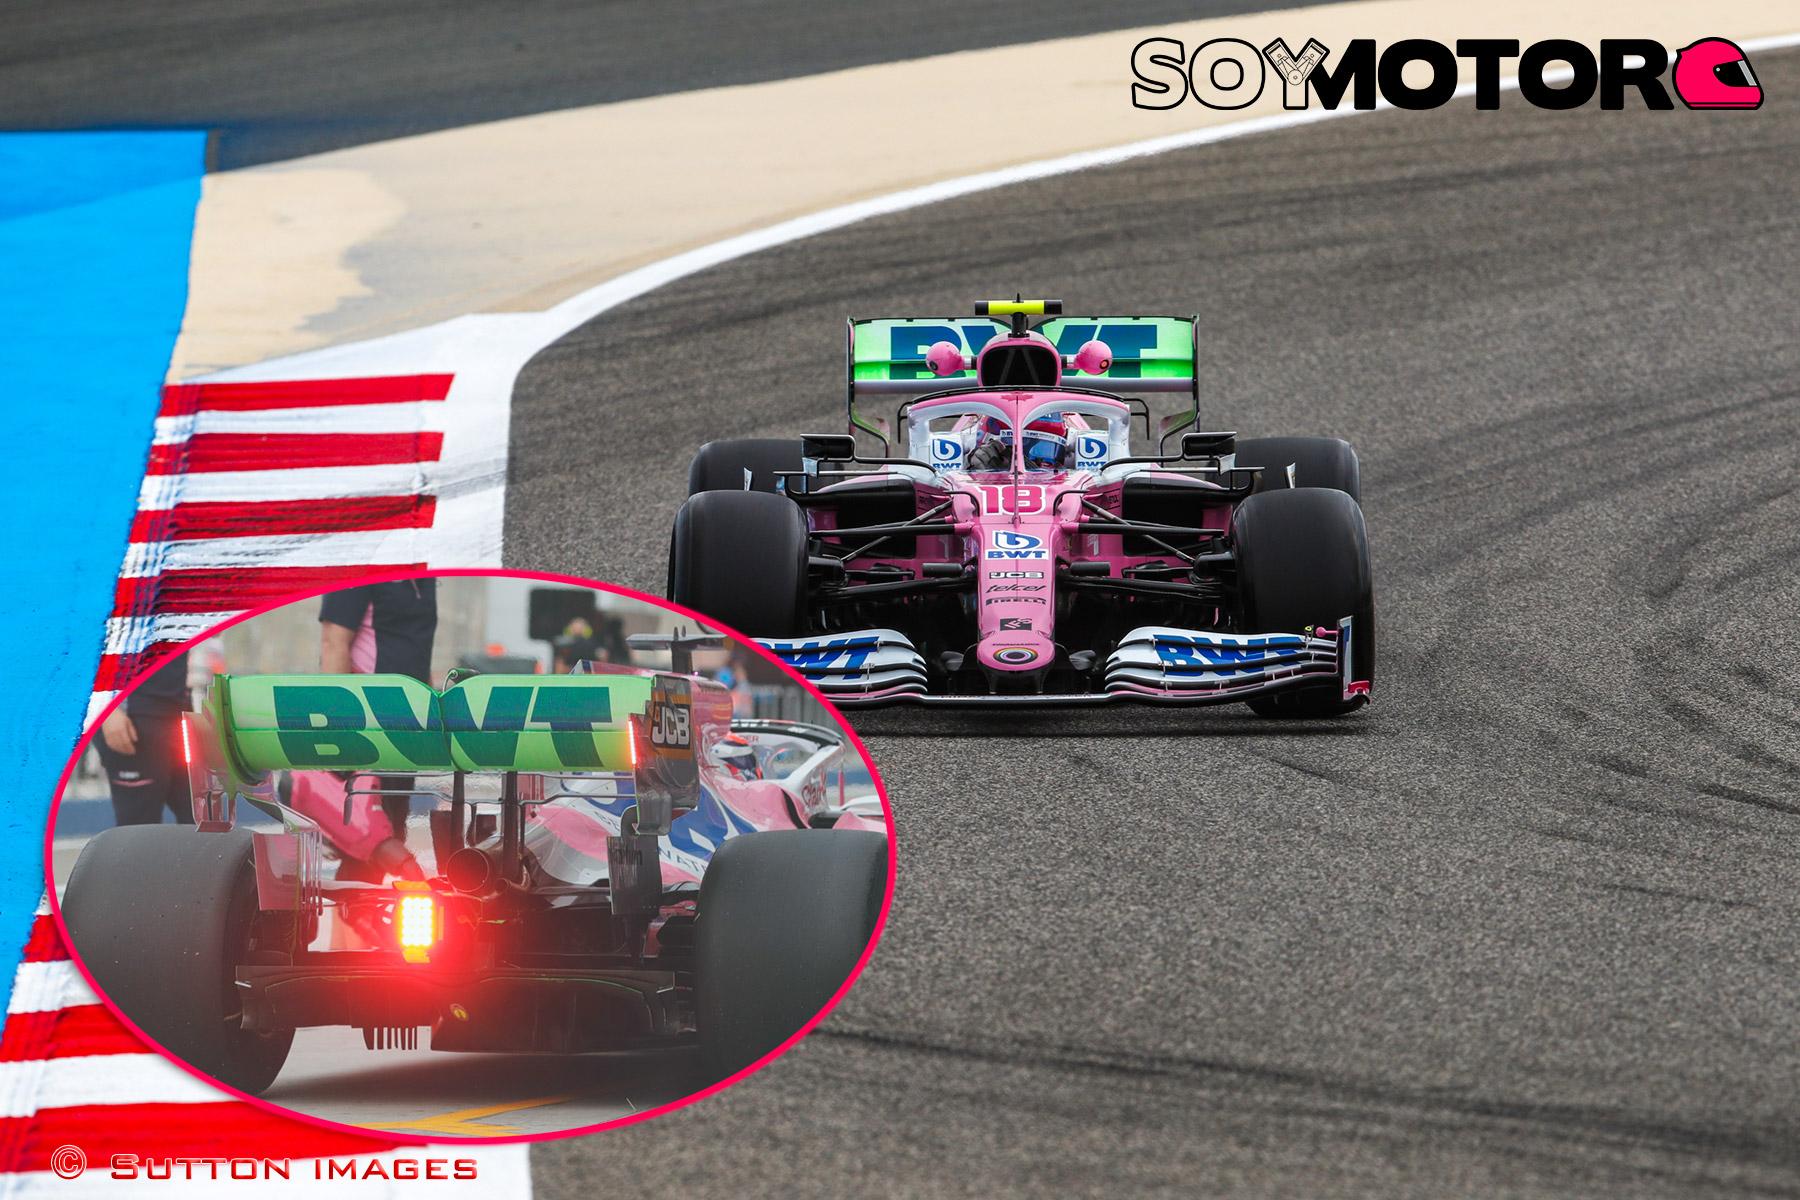 racing-point-parafina-soymotor_3.jpg